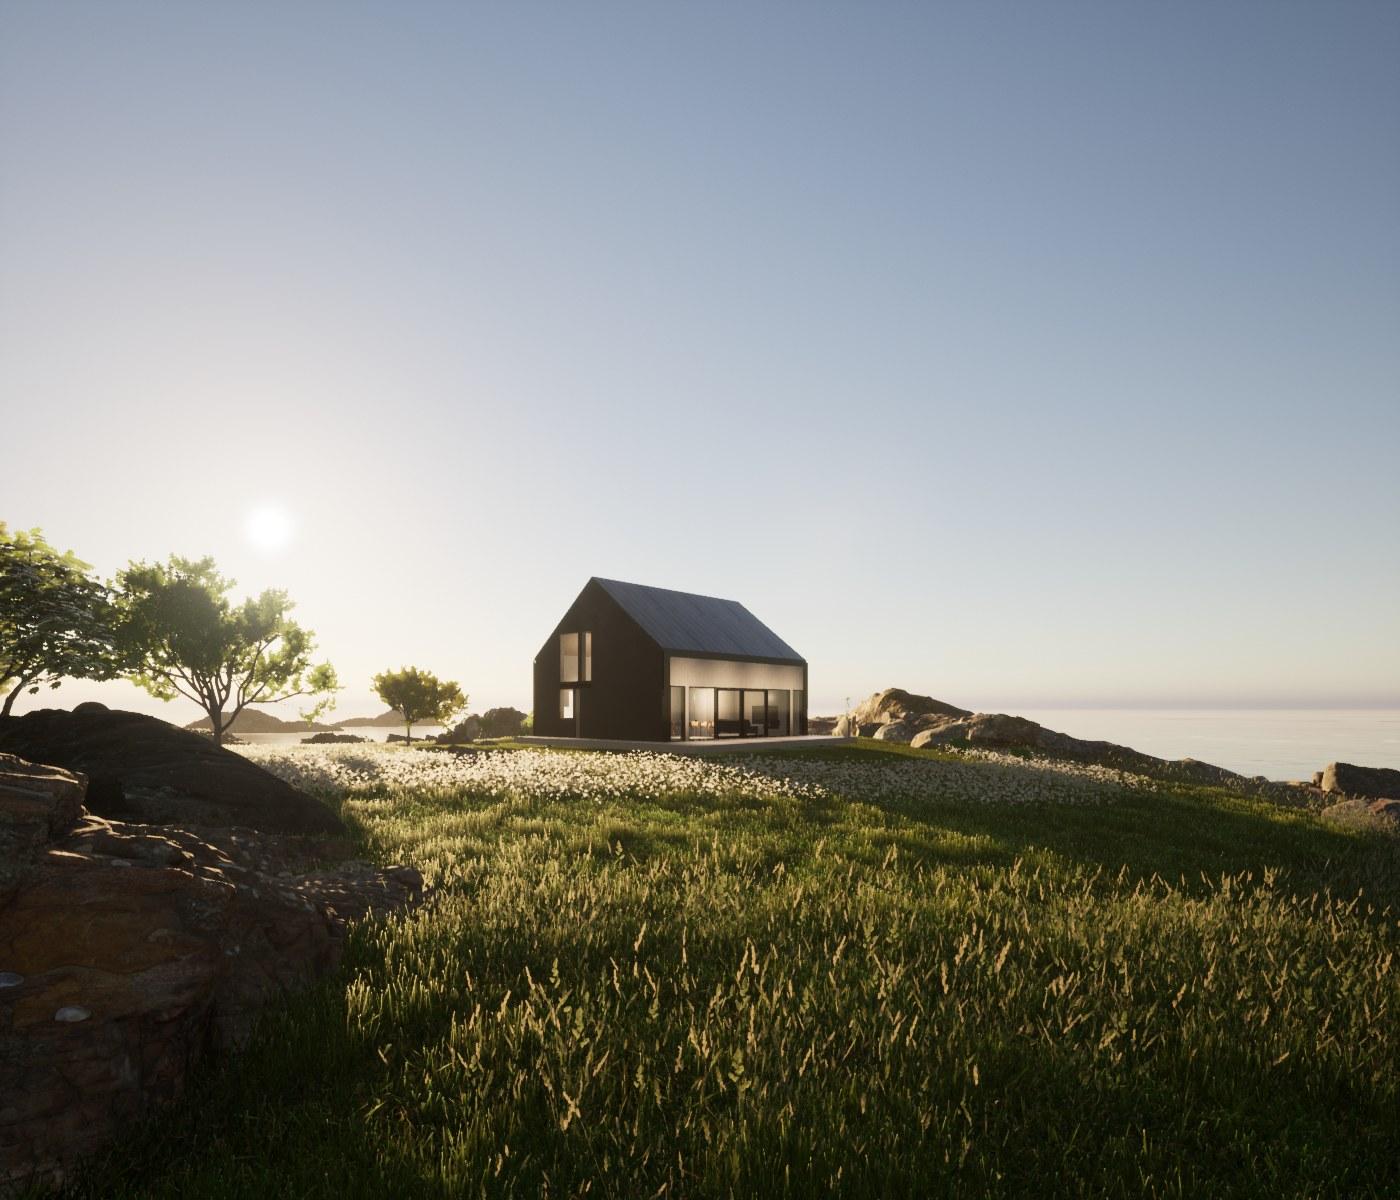 Asumma homes are made of cross-laminated timber.